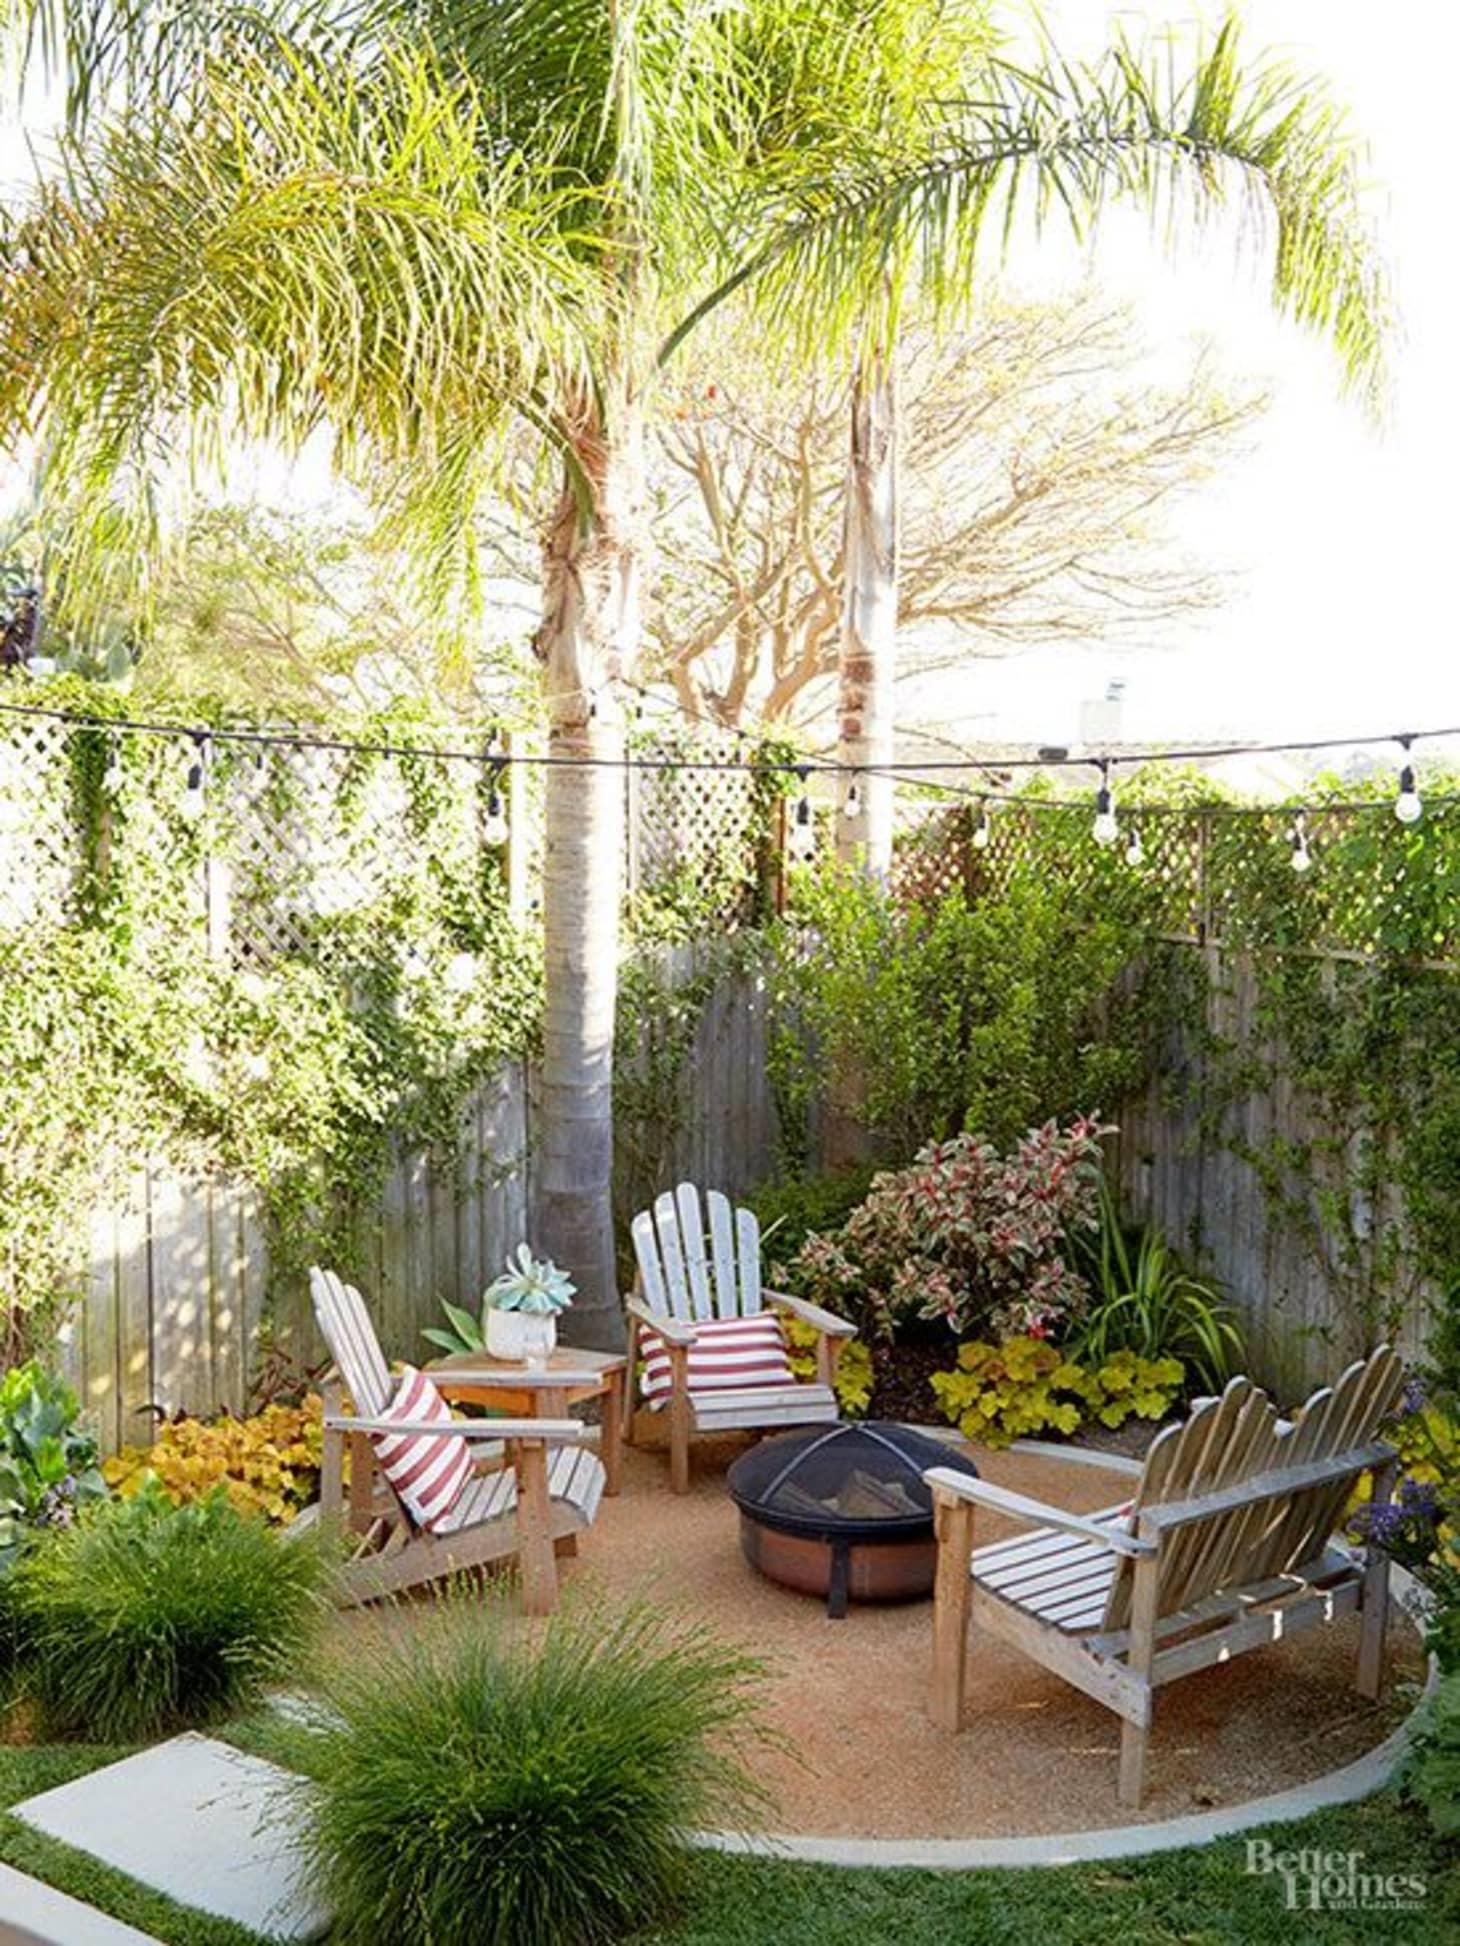 Small Backyard Design Ideas & Inspiration | Apartment Therapy on Apartment Backyard Patio Ideas id=20735